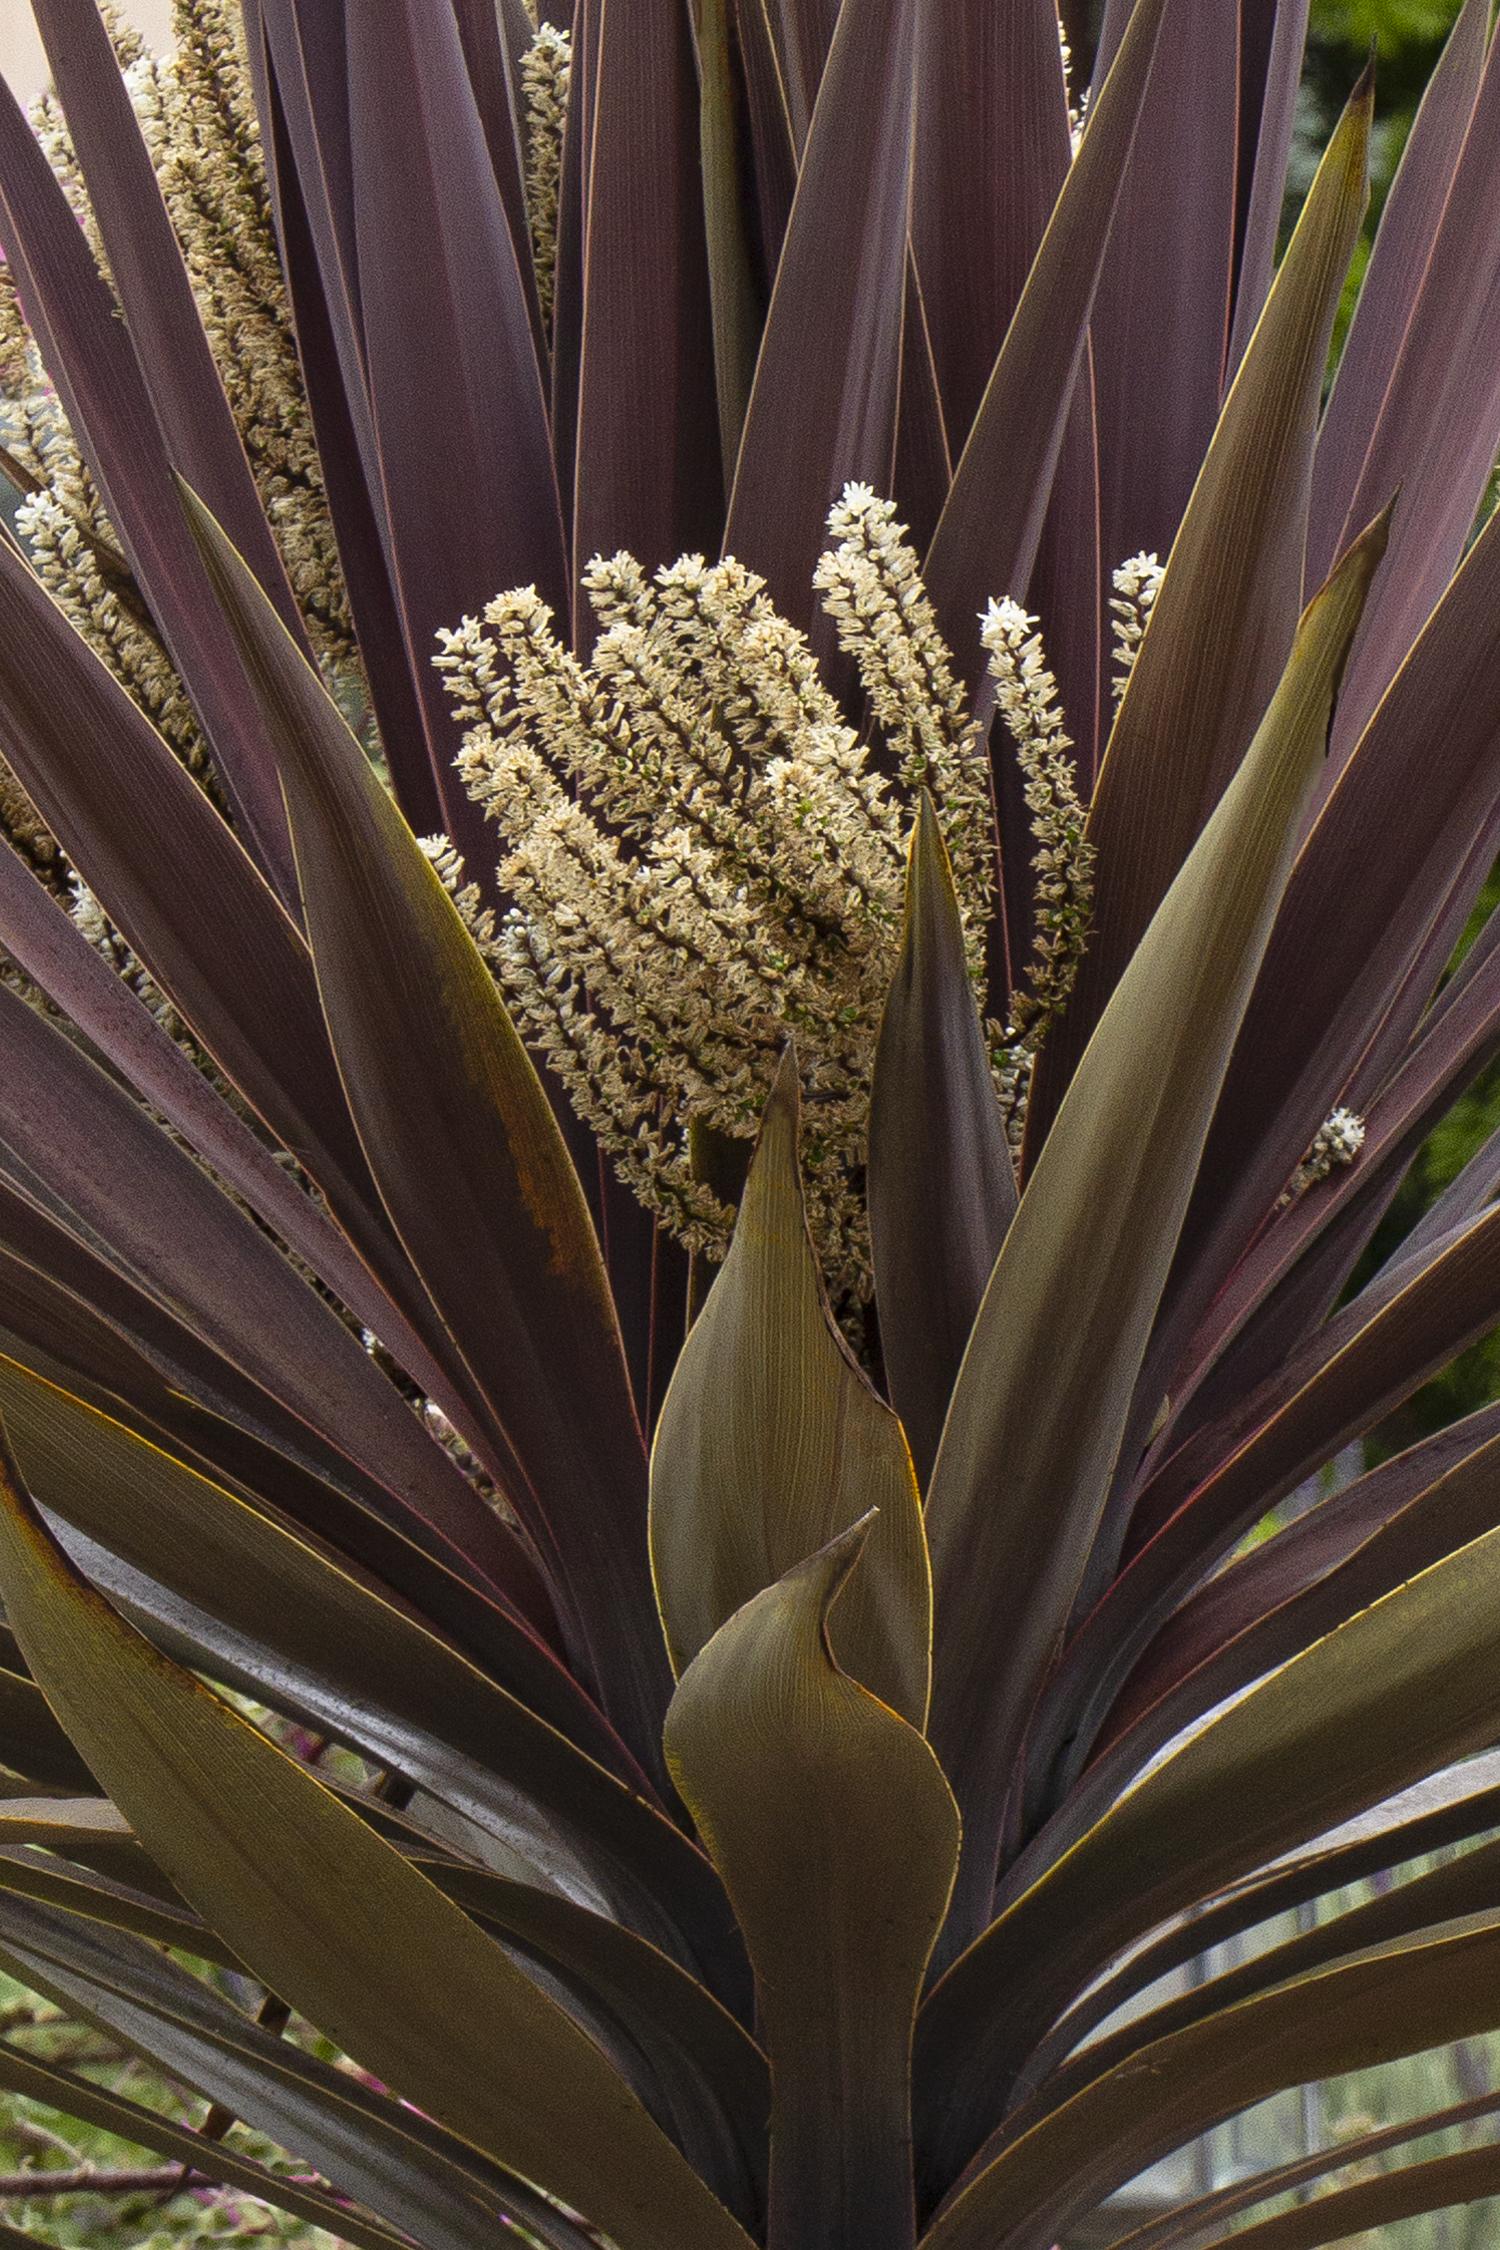 drouight-tolerant cordyline baueri has maroon foliage and a unique cream flowers